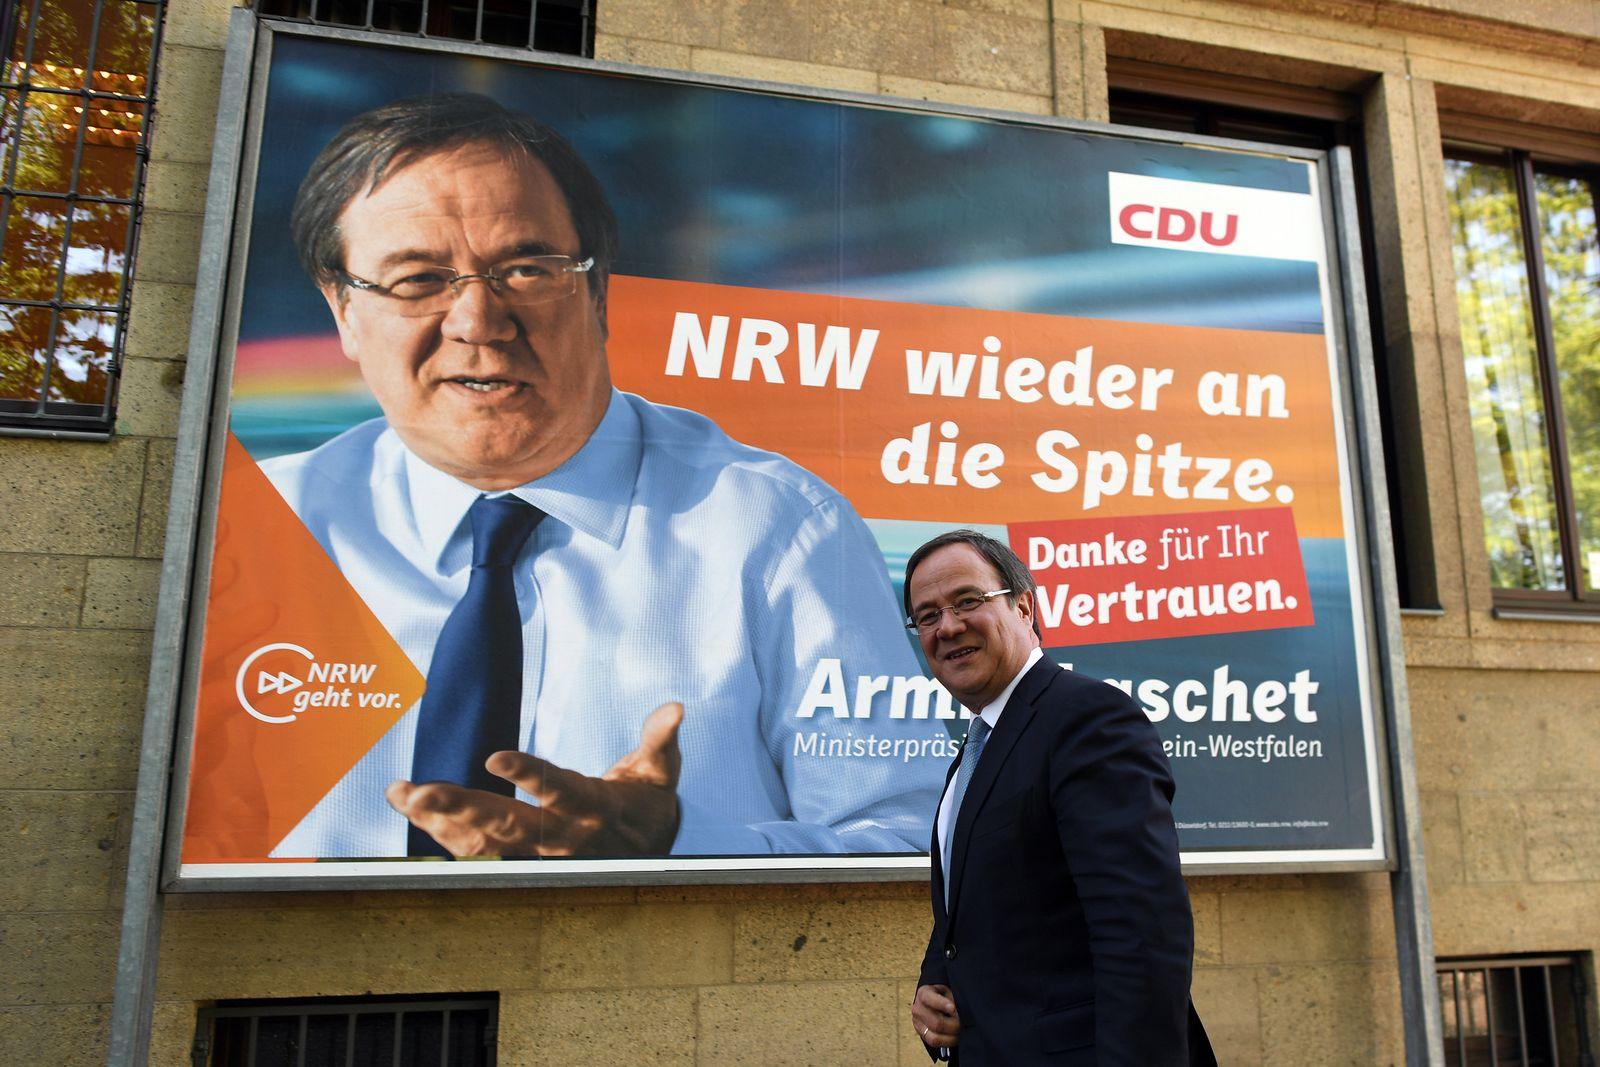 CDU/ wahlkampf / spitzenkandidat / herausforderer